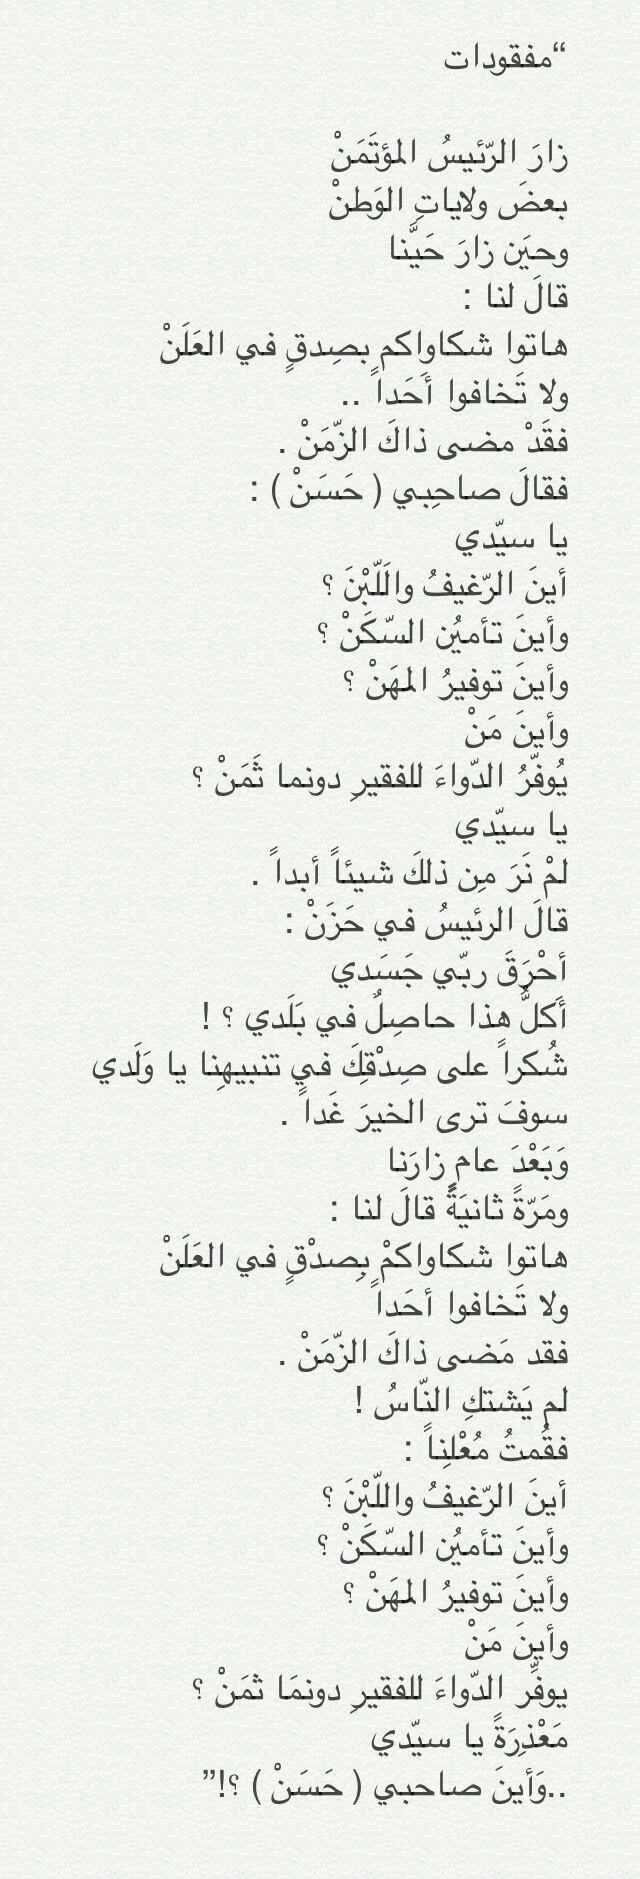 ذكرياااات مع هالقصيدة احمد مطر Arabic Quotes Funny Arabic Quotes Beautiful Arabic Words